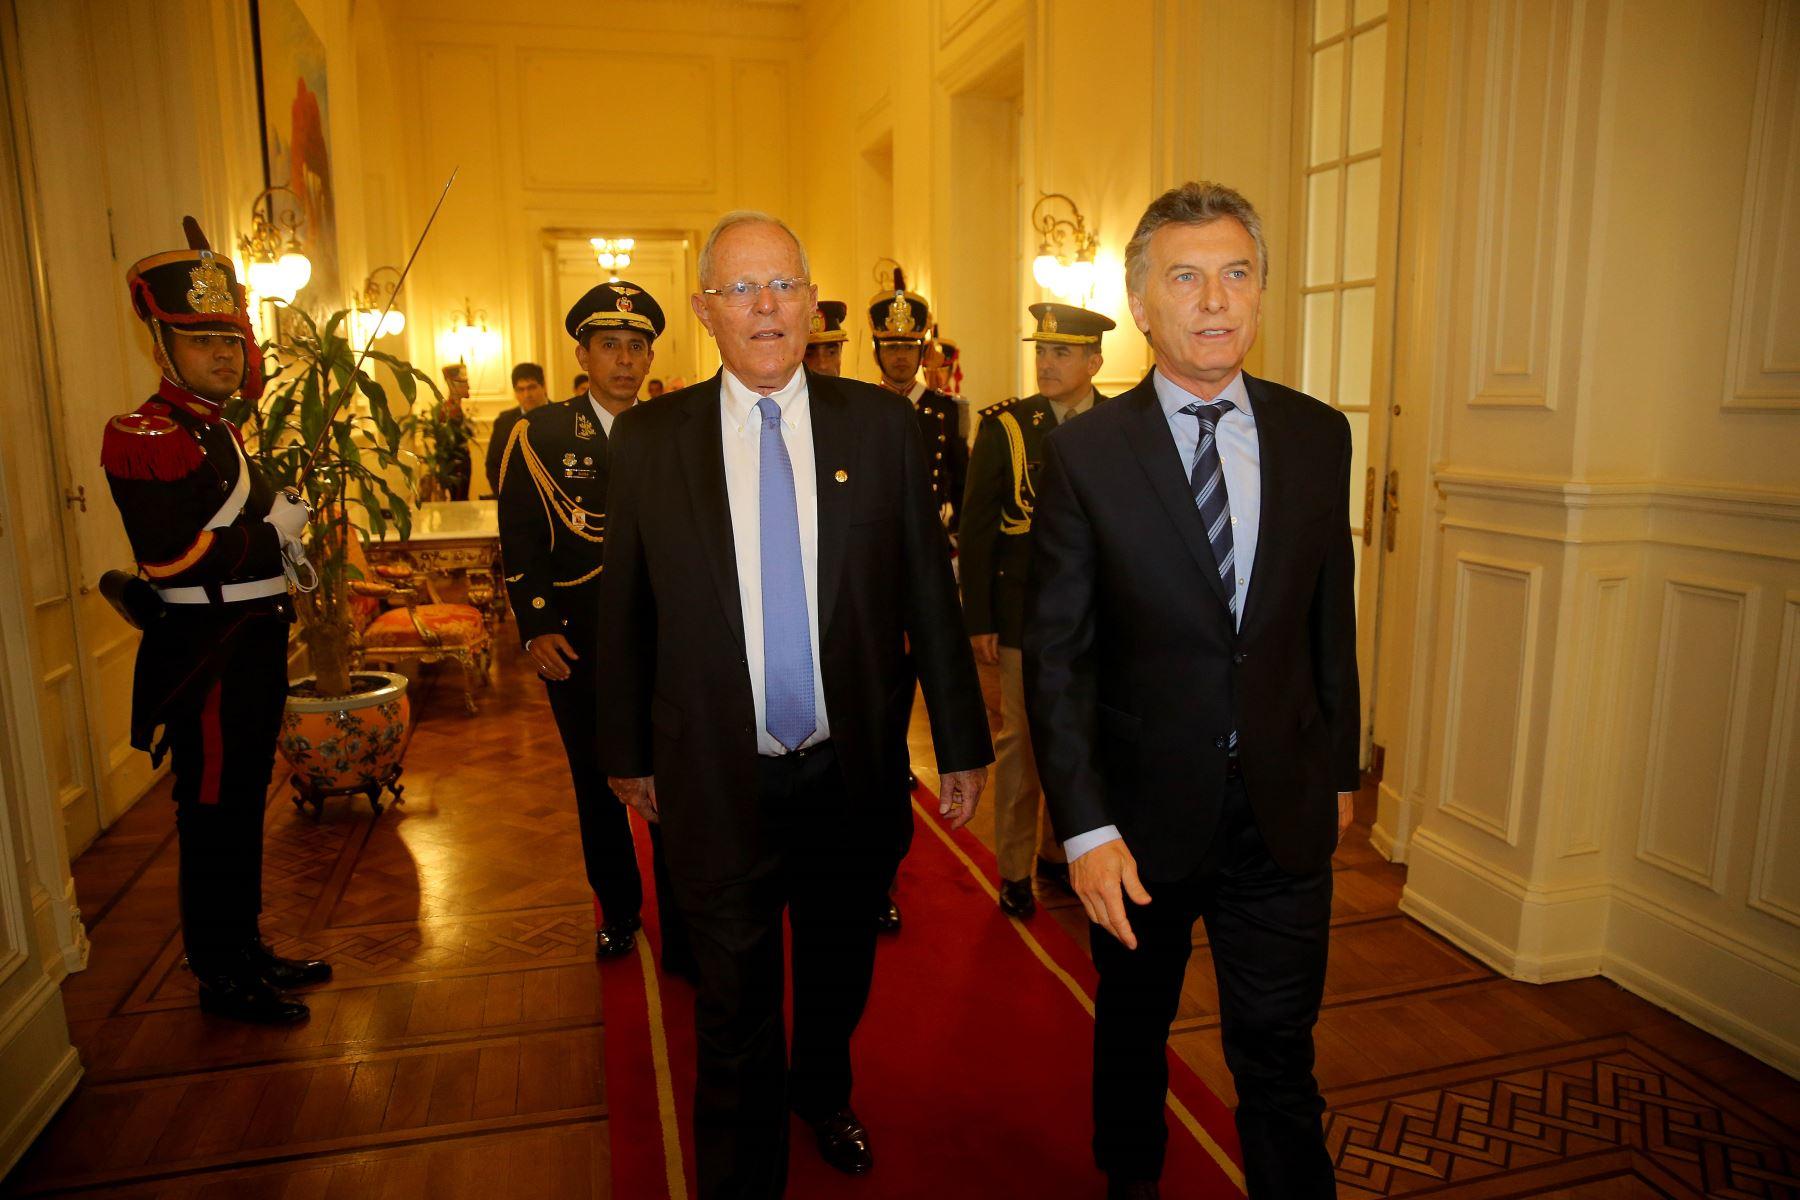 Perú envía avión a apoyar búsqueda de submarino argentino